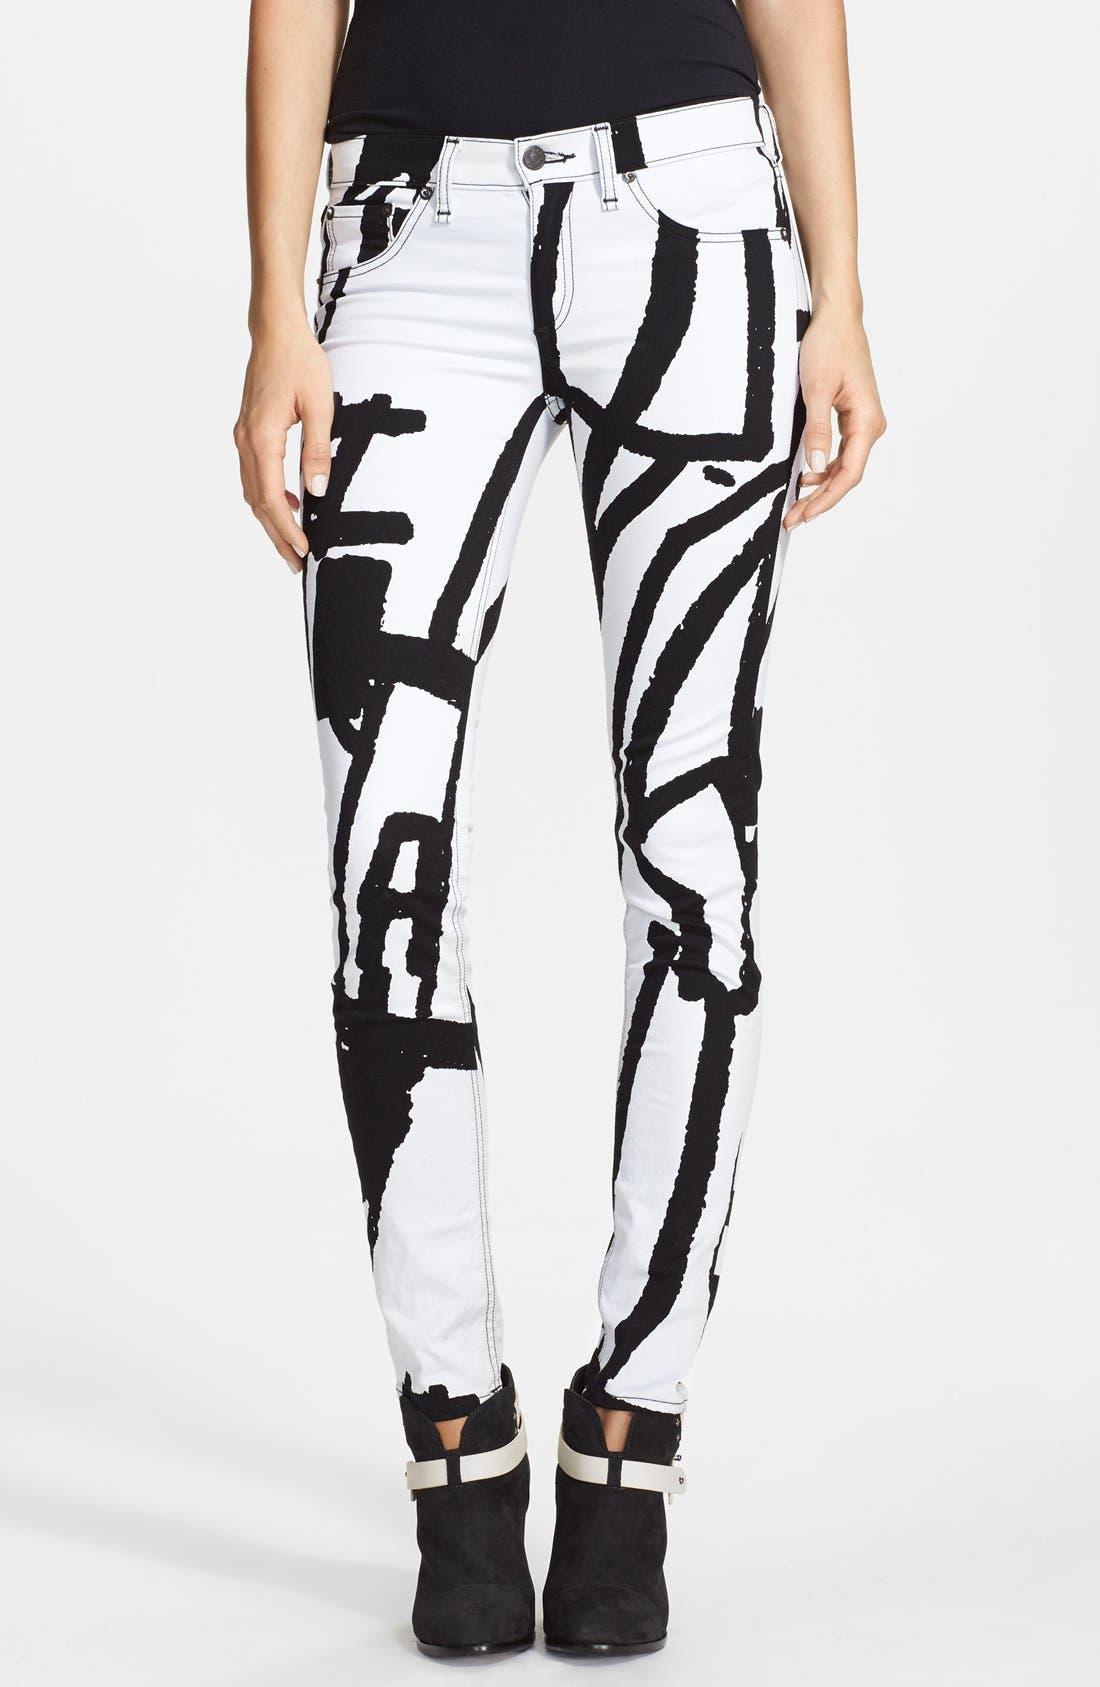 Alternate Image 1 Selected - rag & bone/JEAN 'The Legging' Graphic Print Skinny Jeans (White Robot)